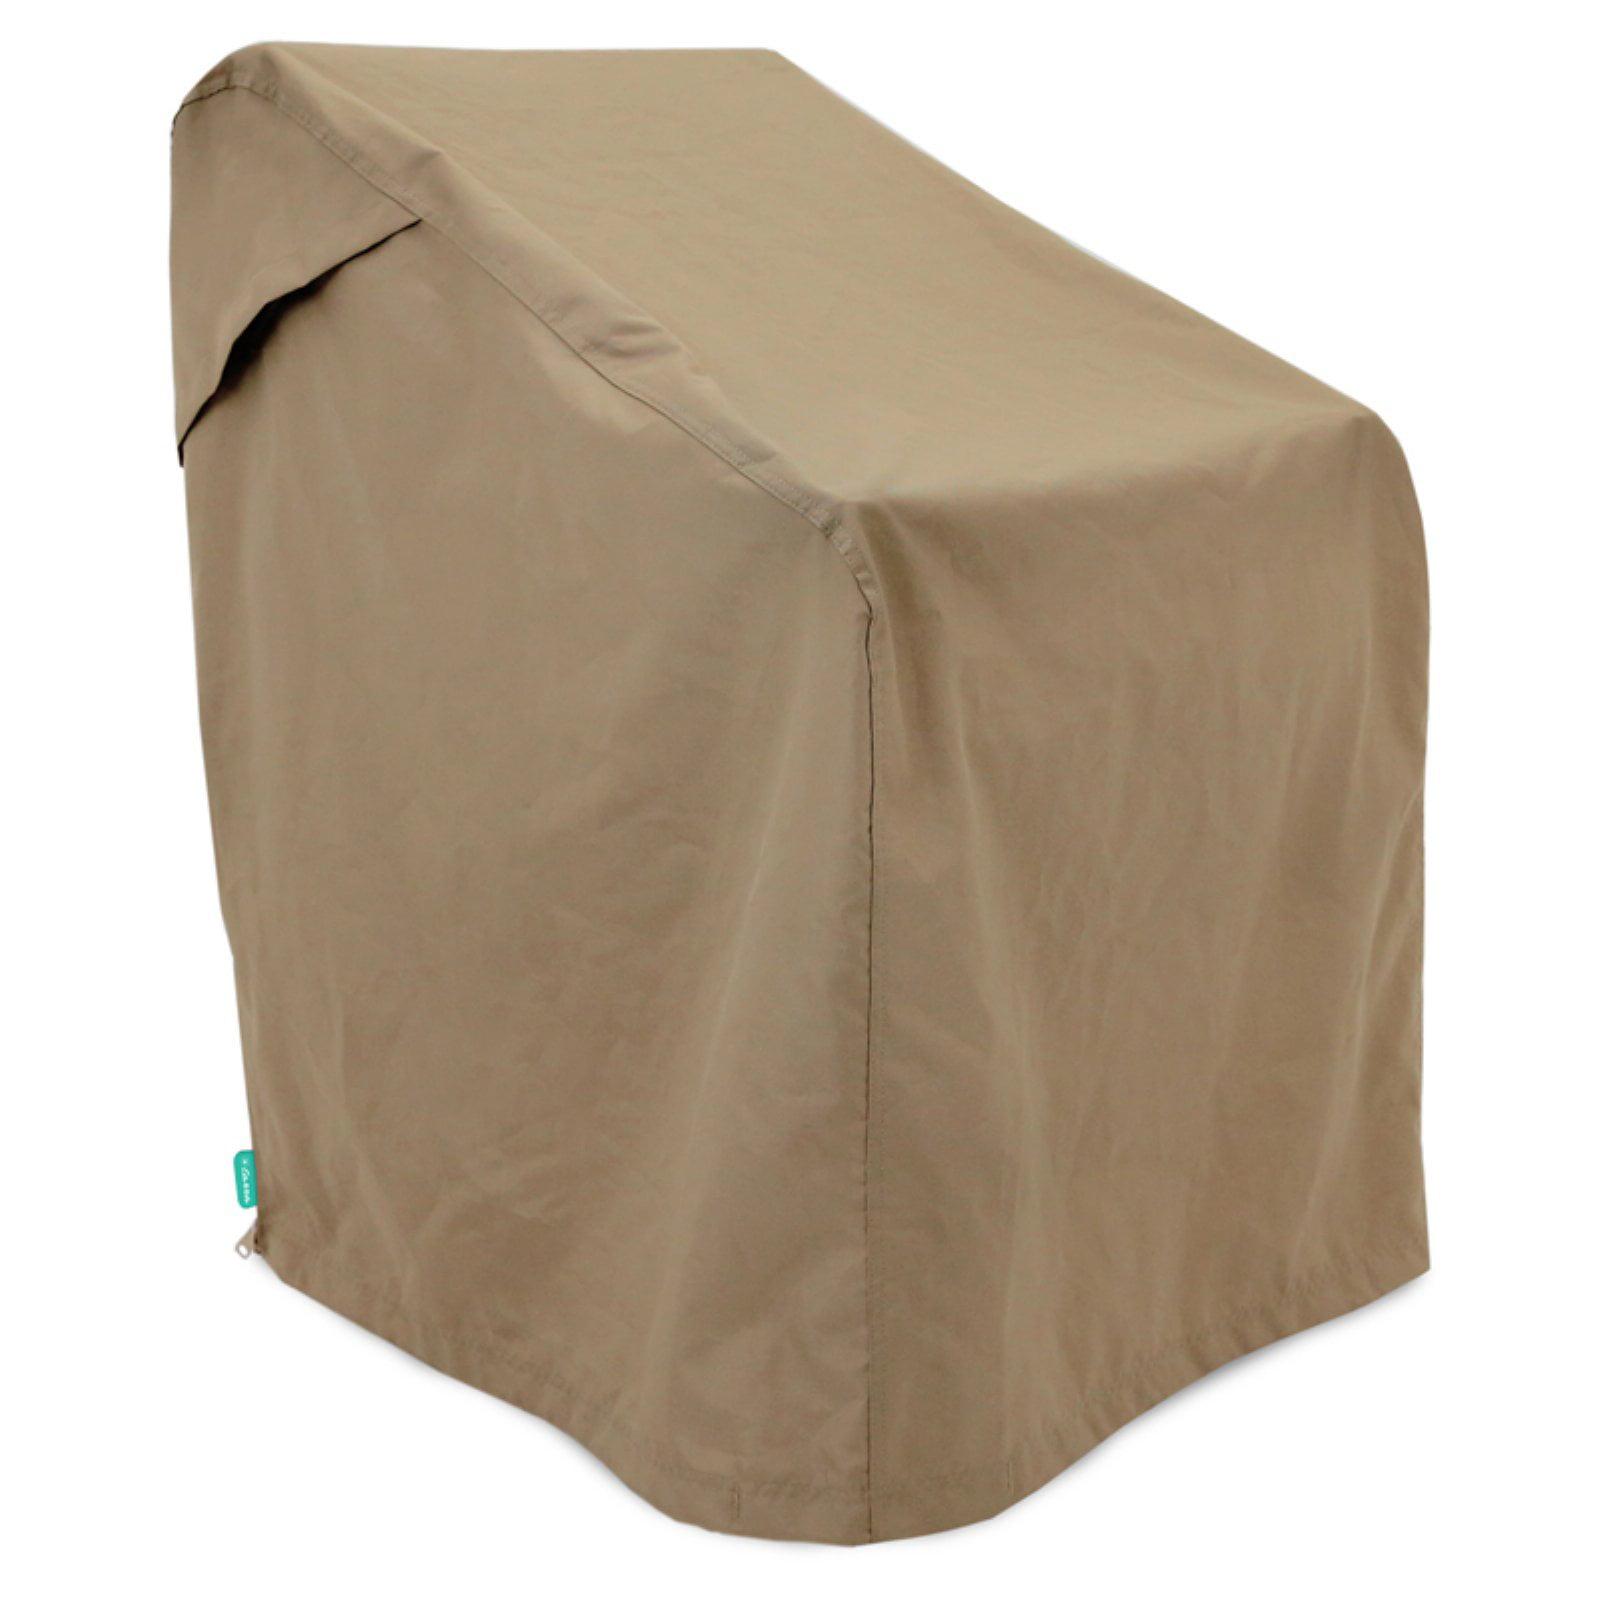 Tarra Home Universal Outdoor UFCCP202036PT Patio Chair Cover